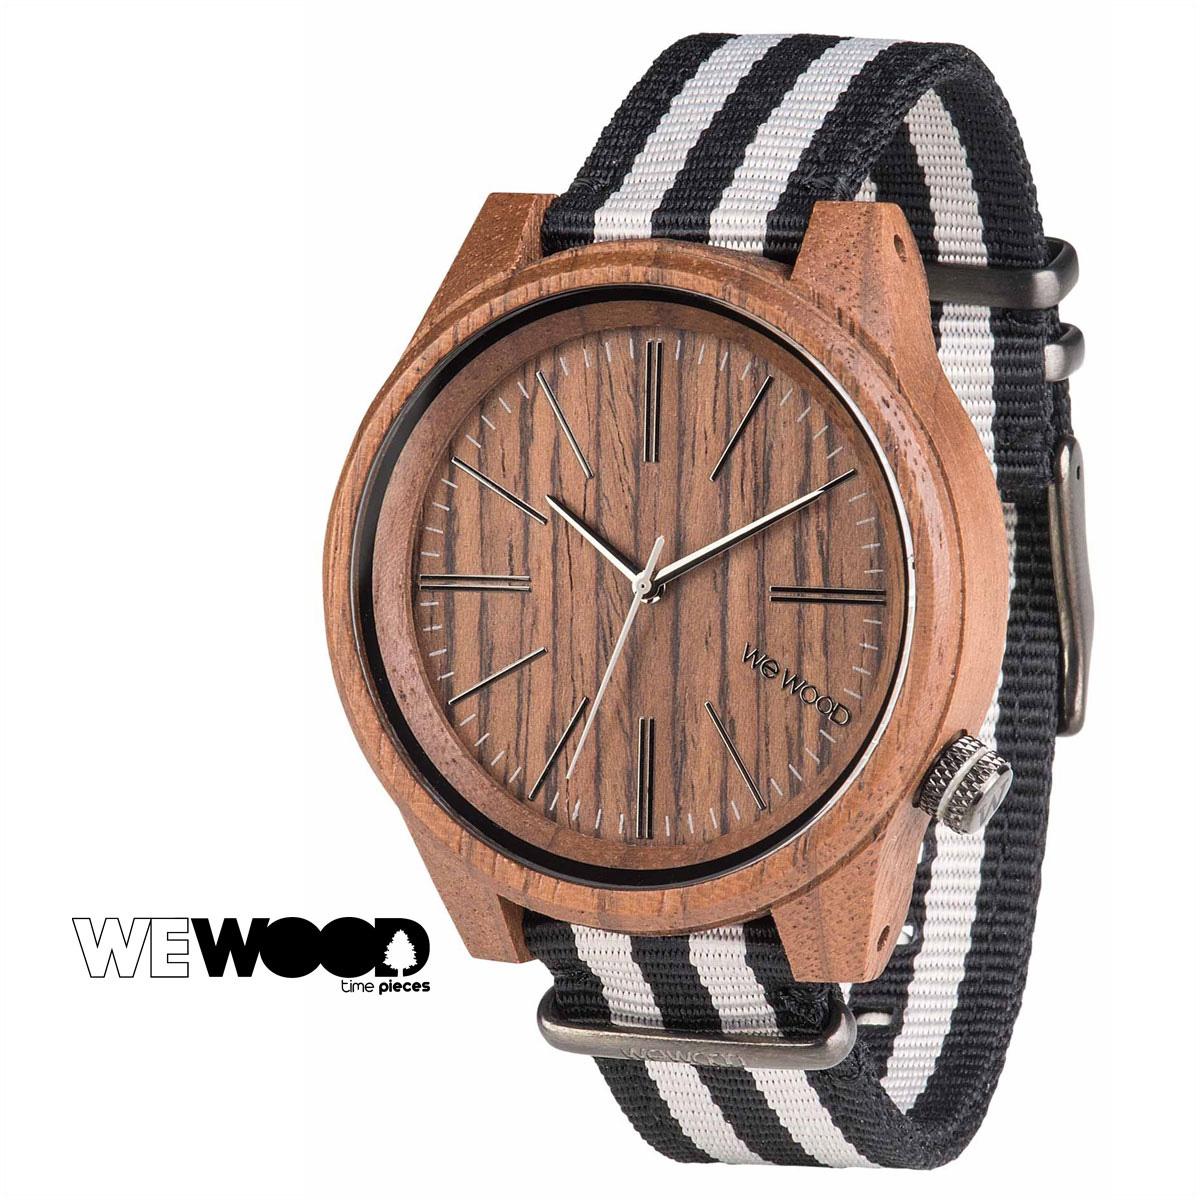 WEWOOD 腕時計 レディース ウィーウッド TORPEDO グレー NUT GREY メンズ